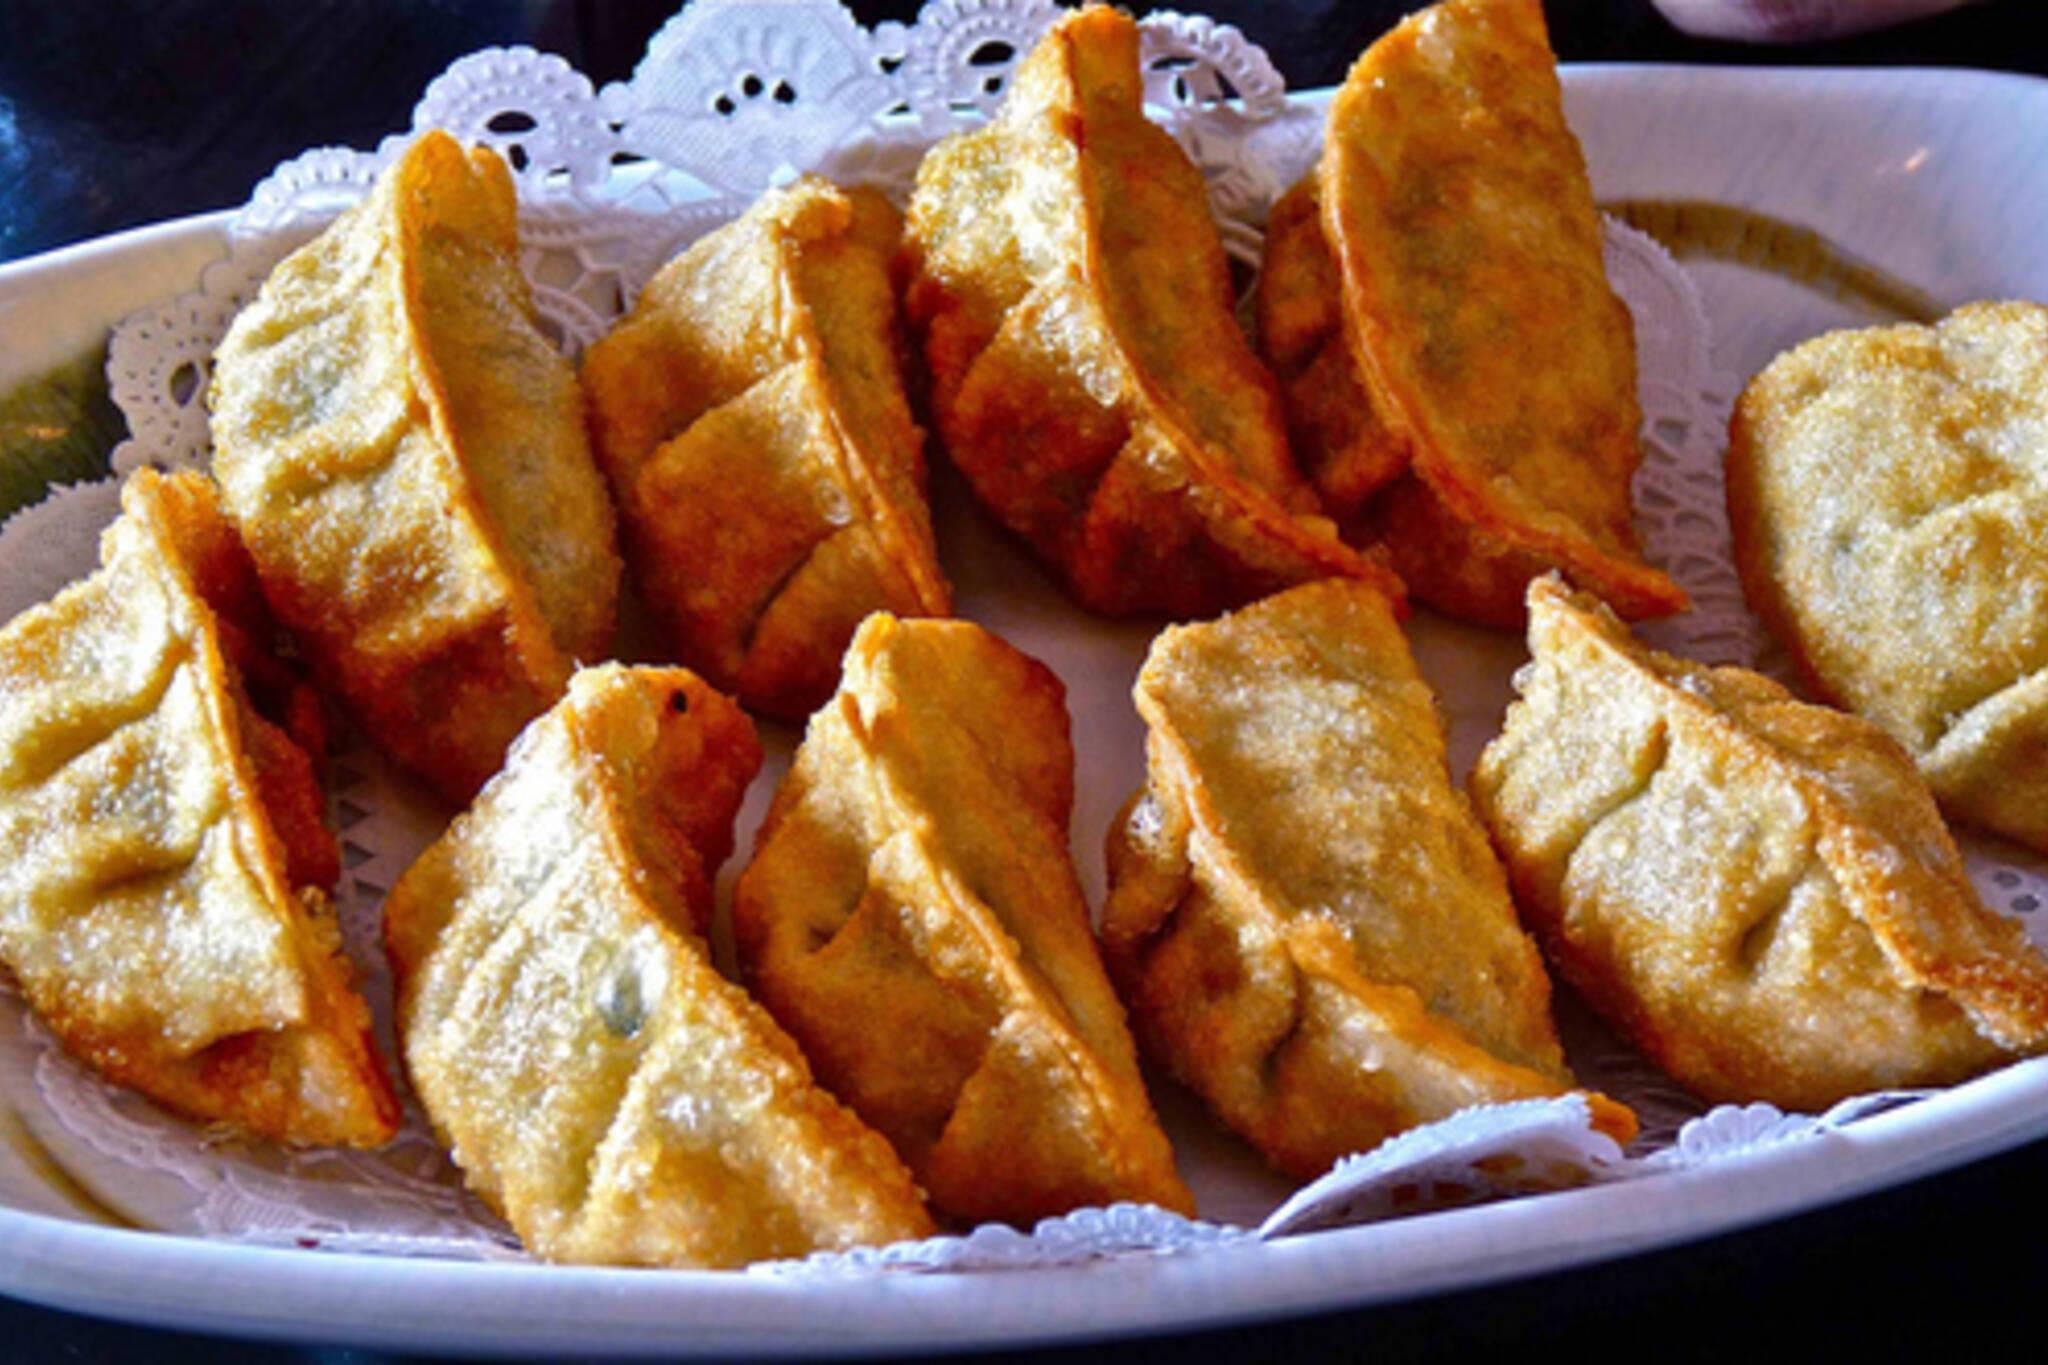 Korean Fried Dumplings